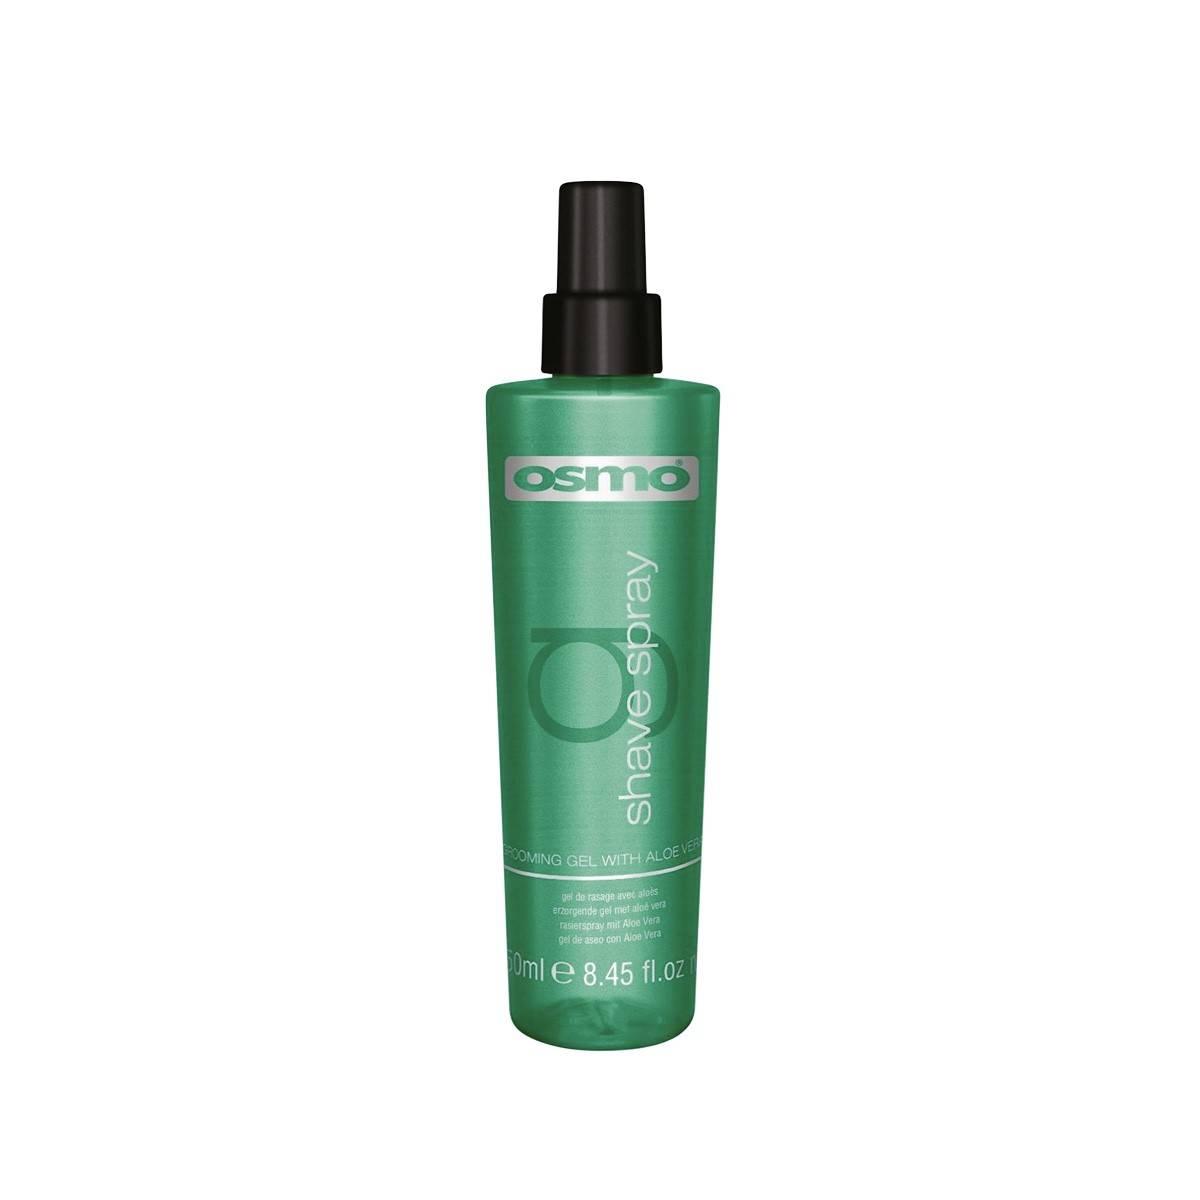 Aloe Vera Shave Spray 250ml Multi-purpose Grooming Gel